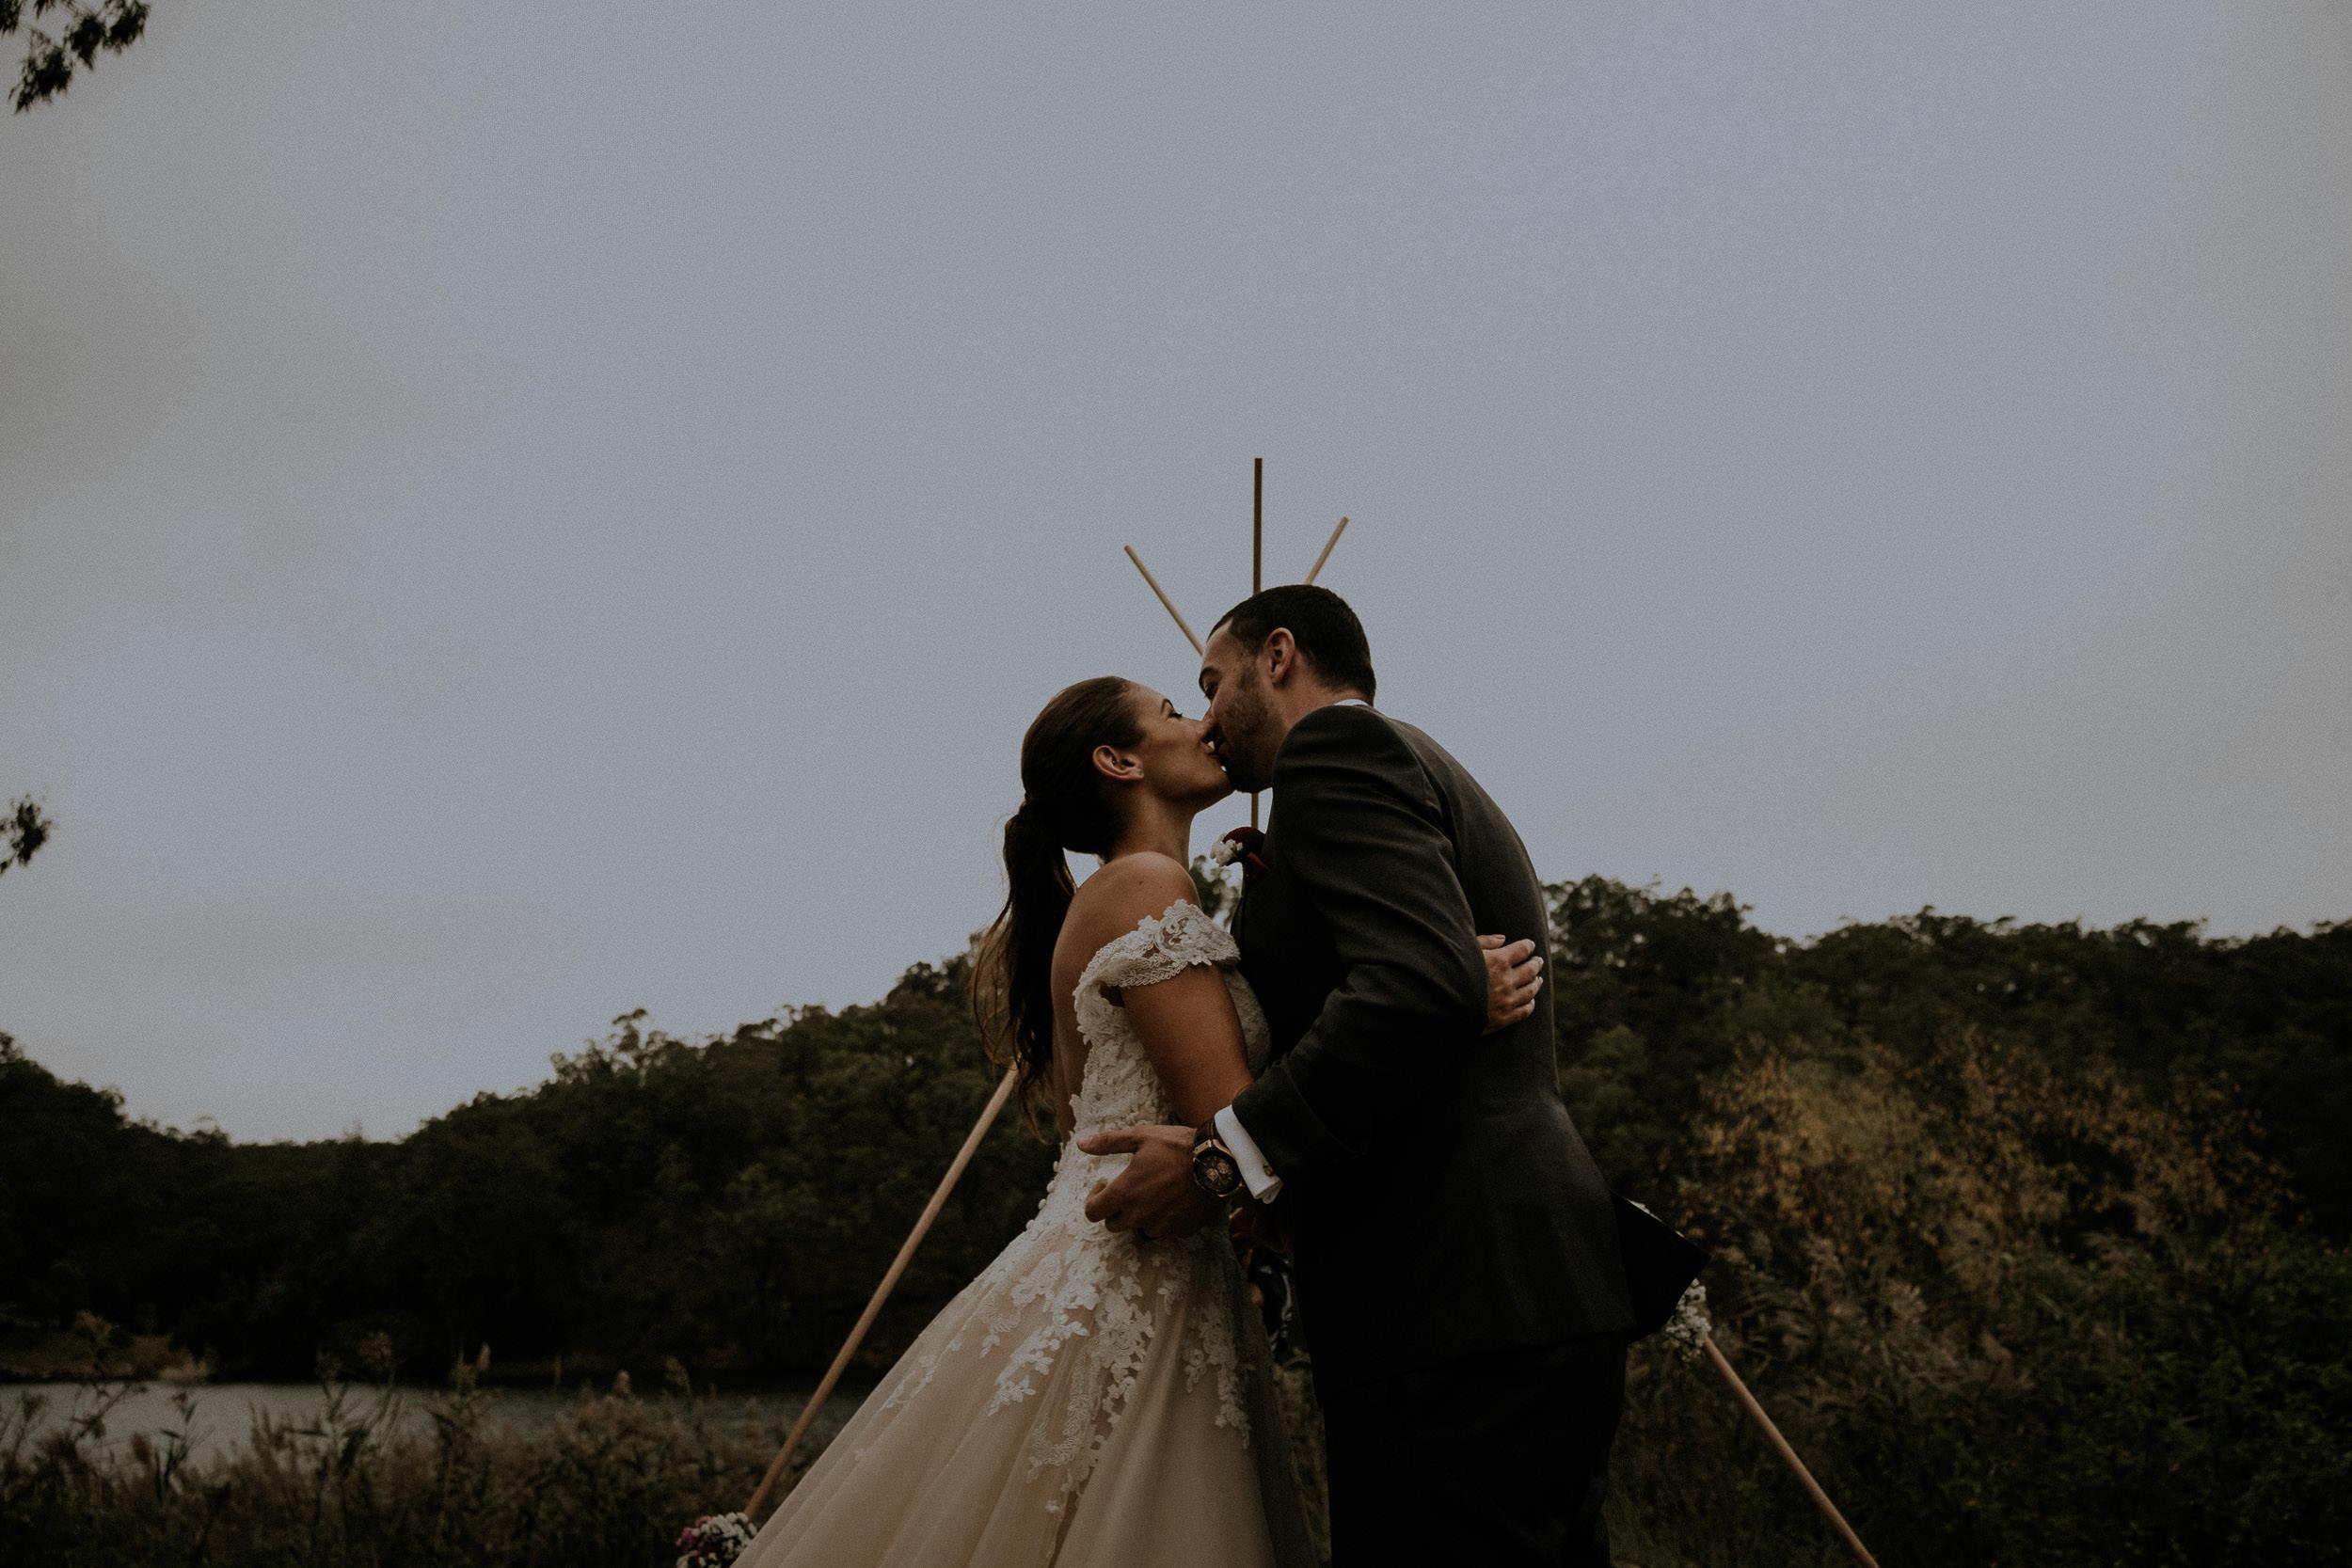 g_c wedding - kings _ thieves elopement wedding photography - blog 41.jpg